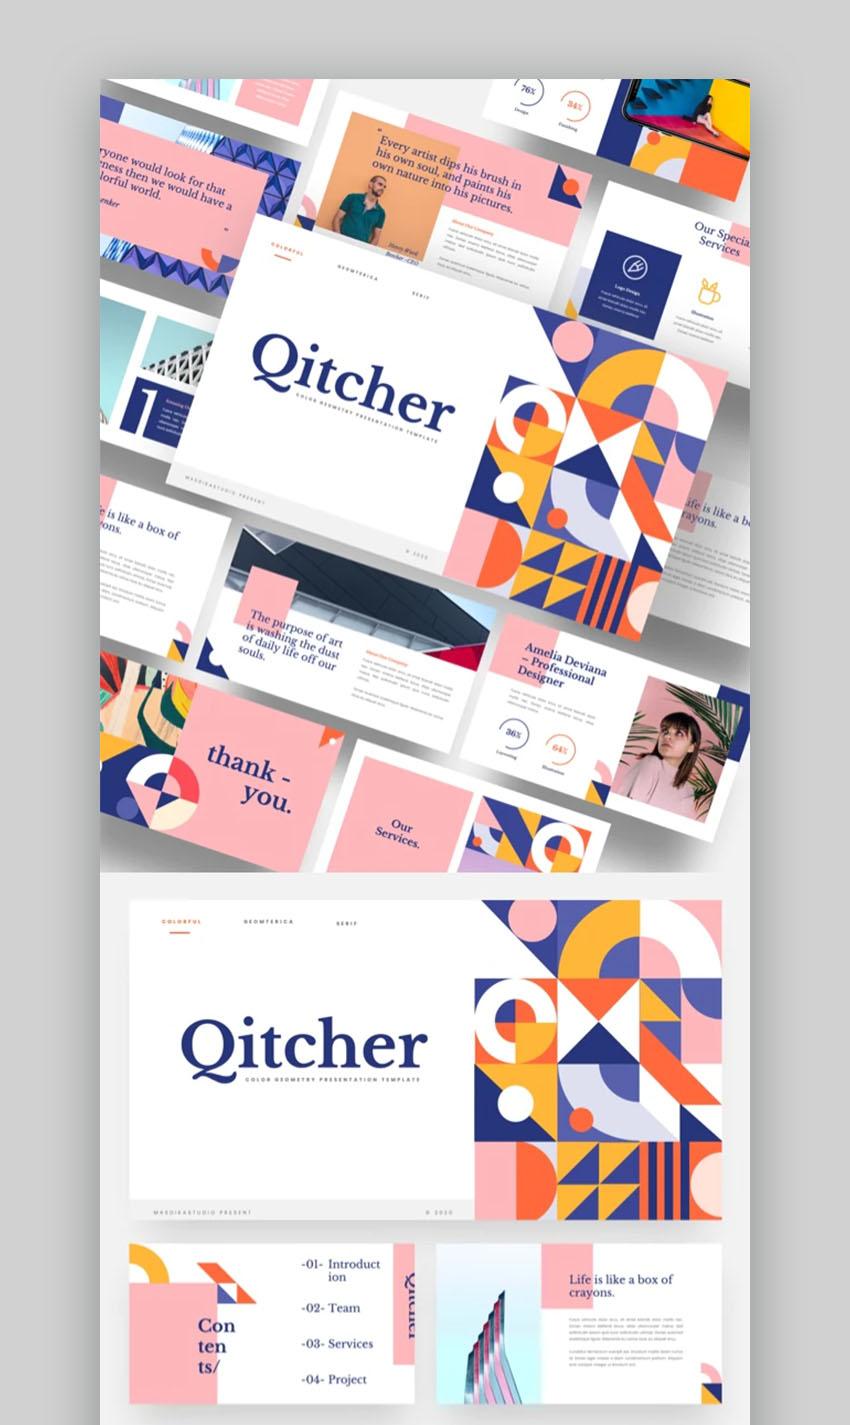 Qitcher Colorful Presentation Templates